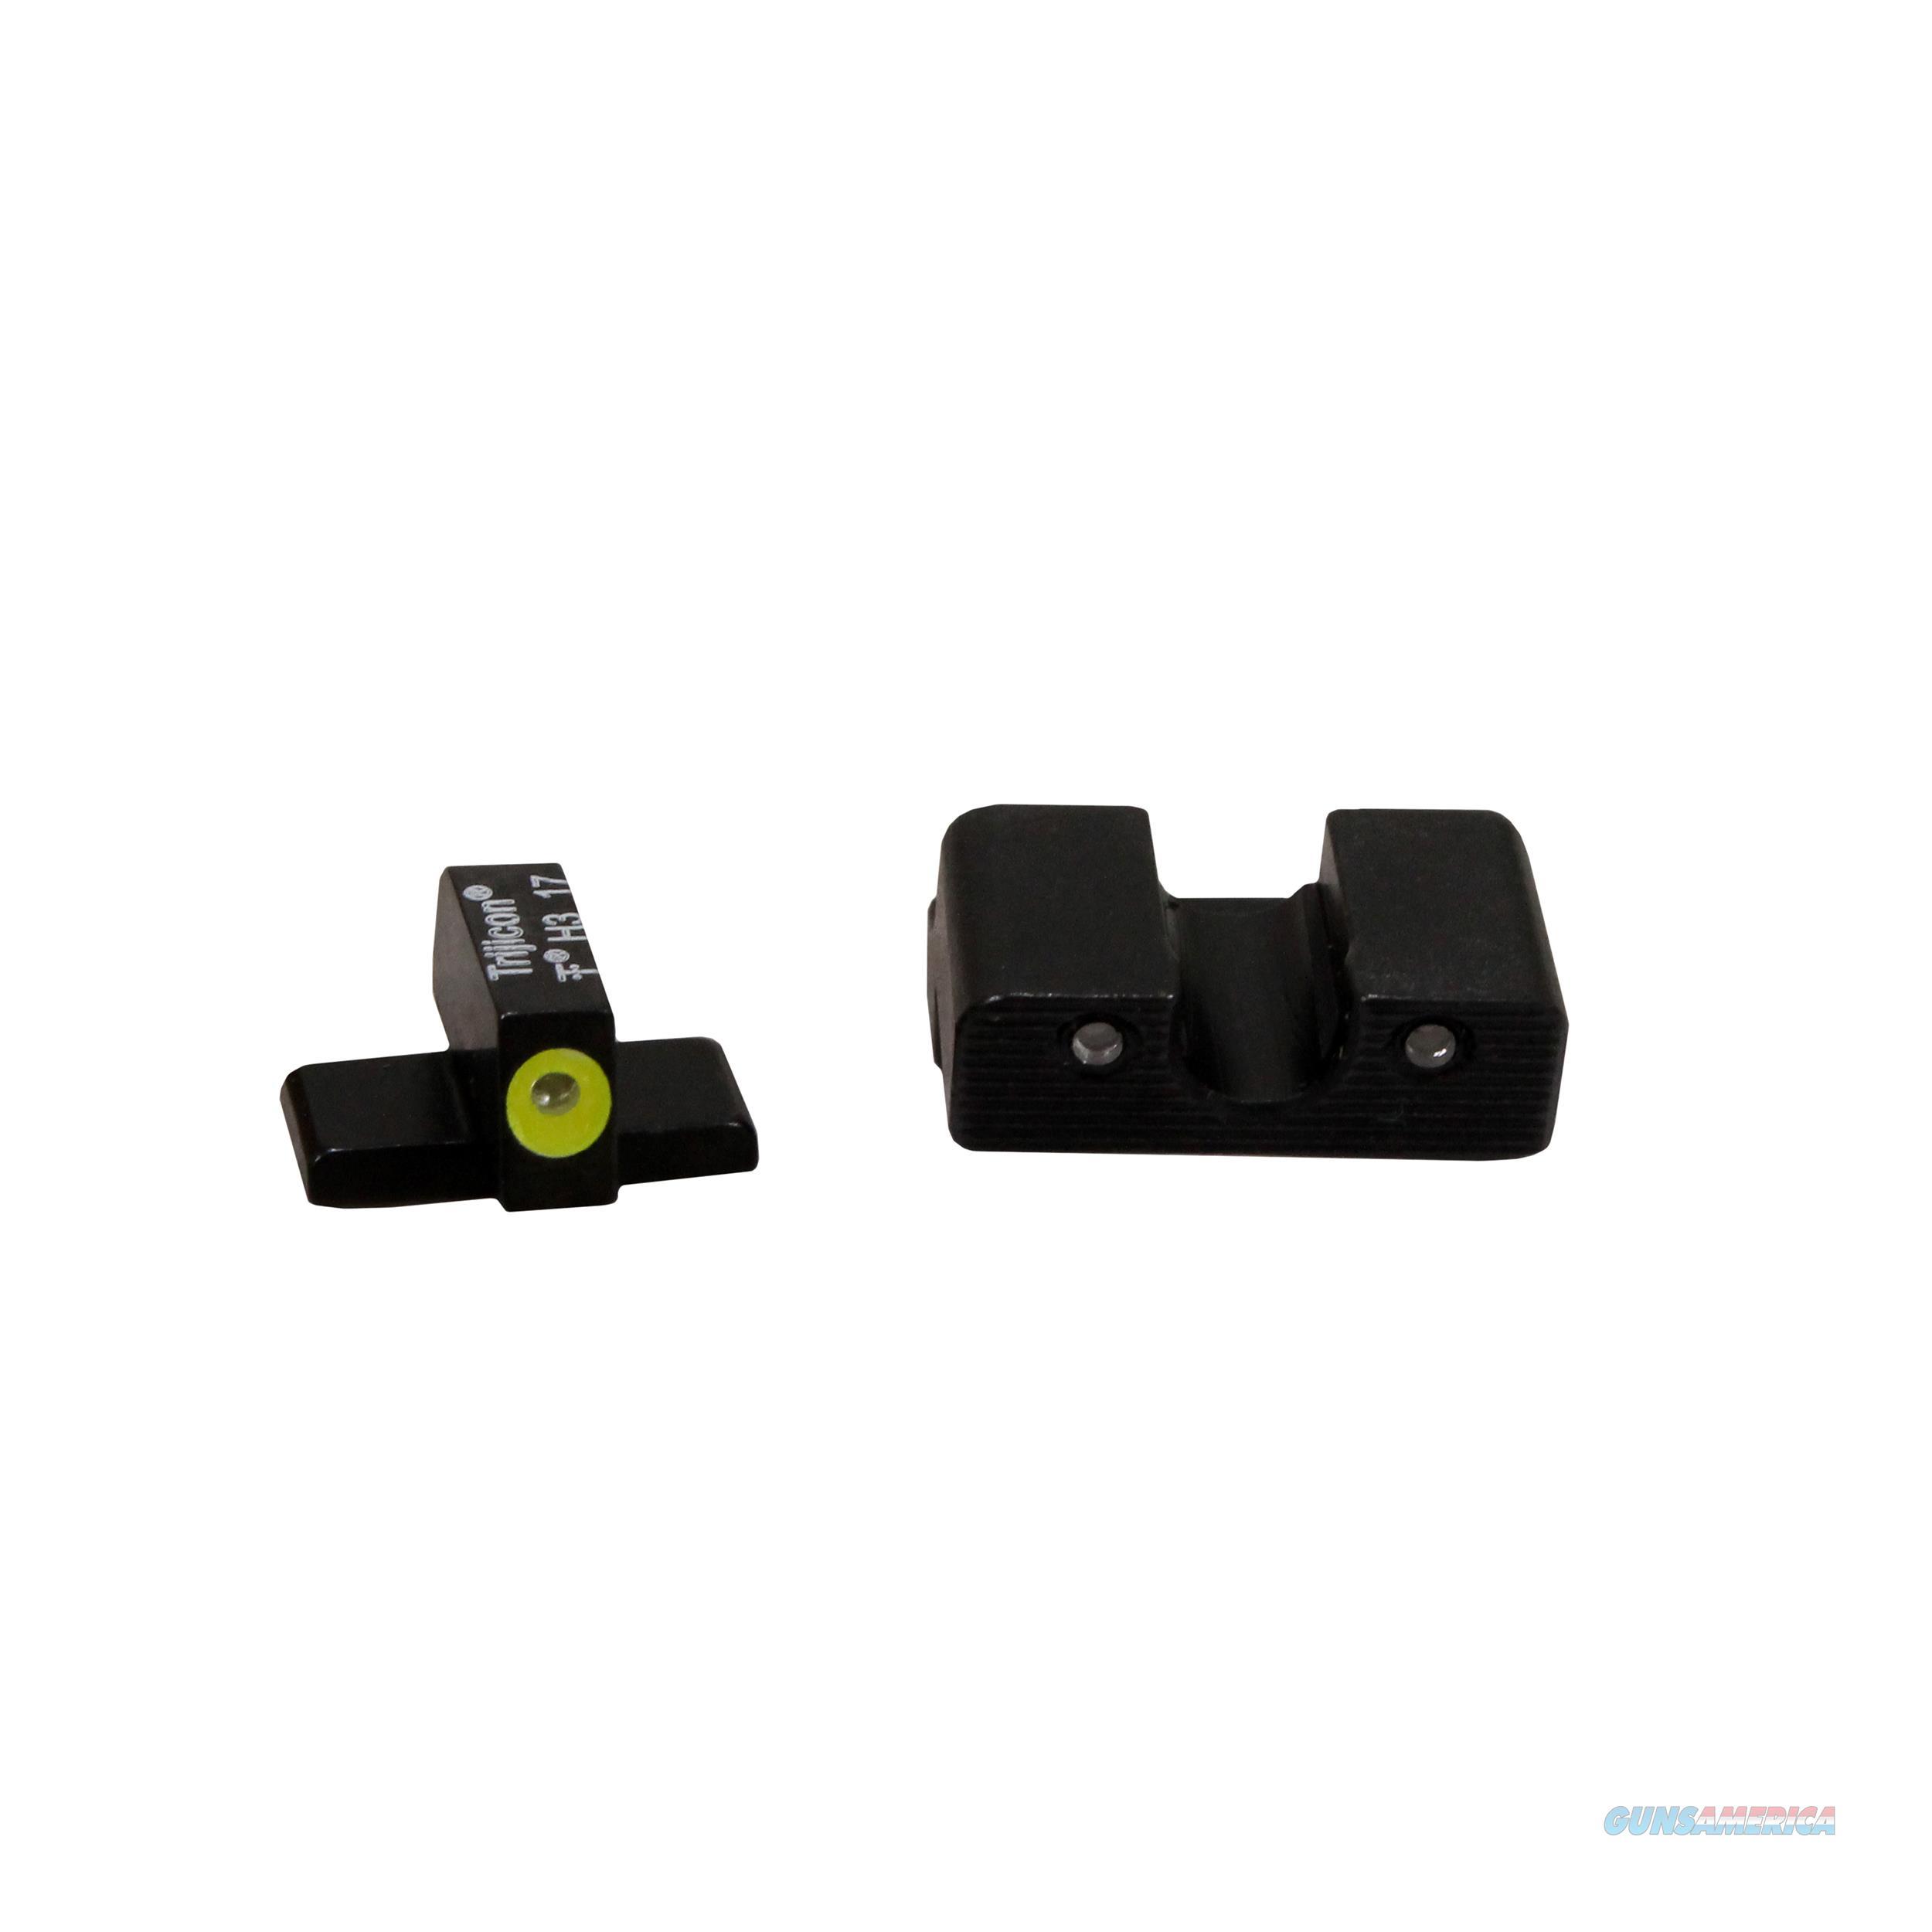 Trijicon Hd Xr Night Sight Set SP601-C-600870  Non-Guns > Iron/Metal/Peep Sights